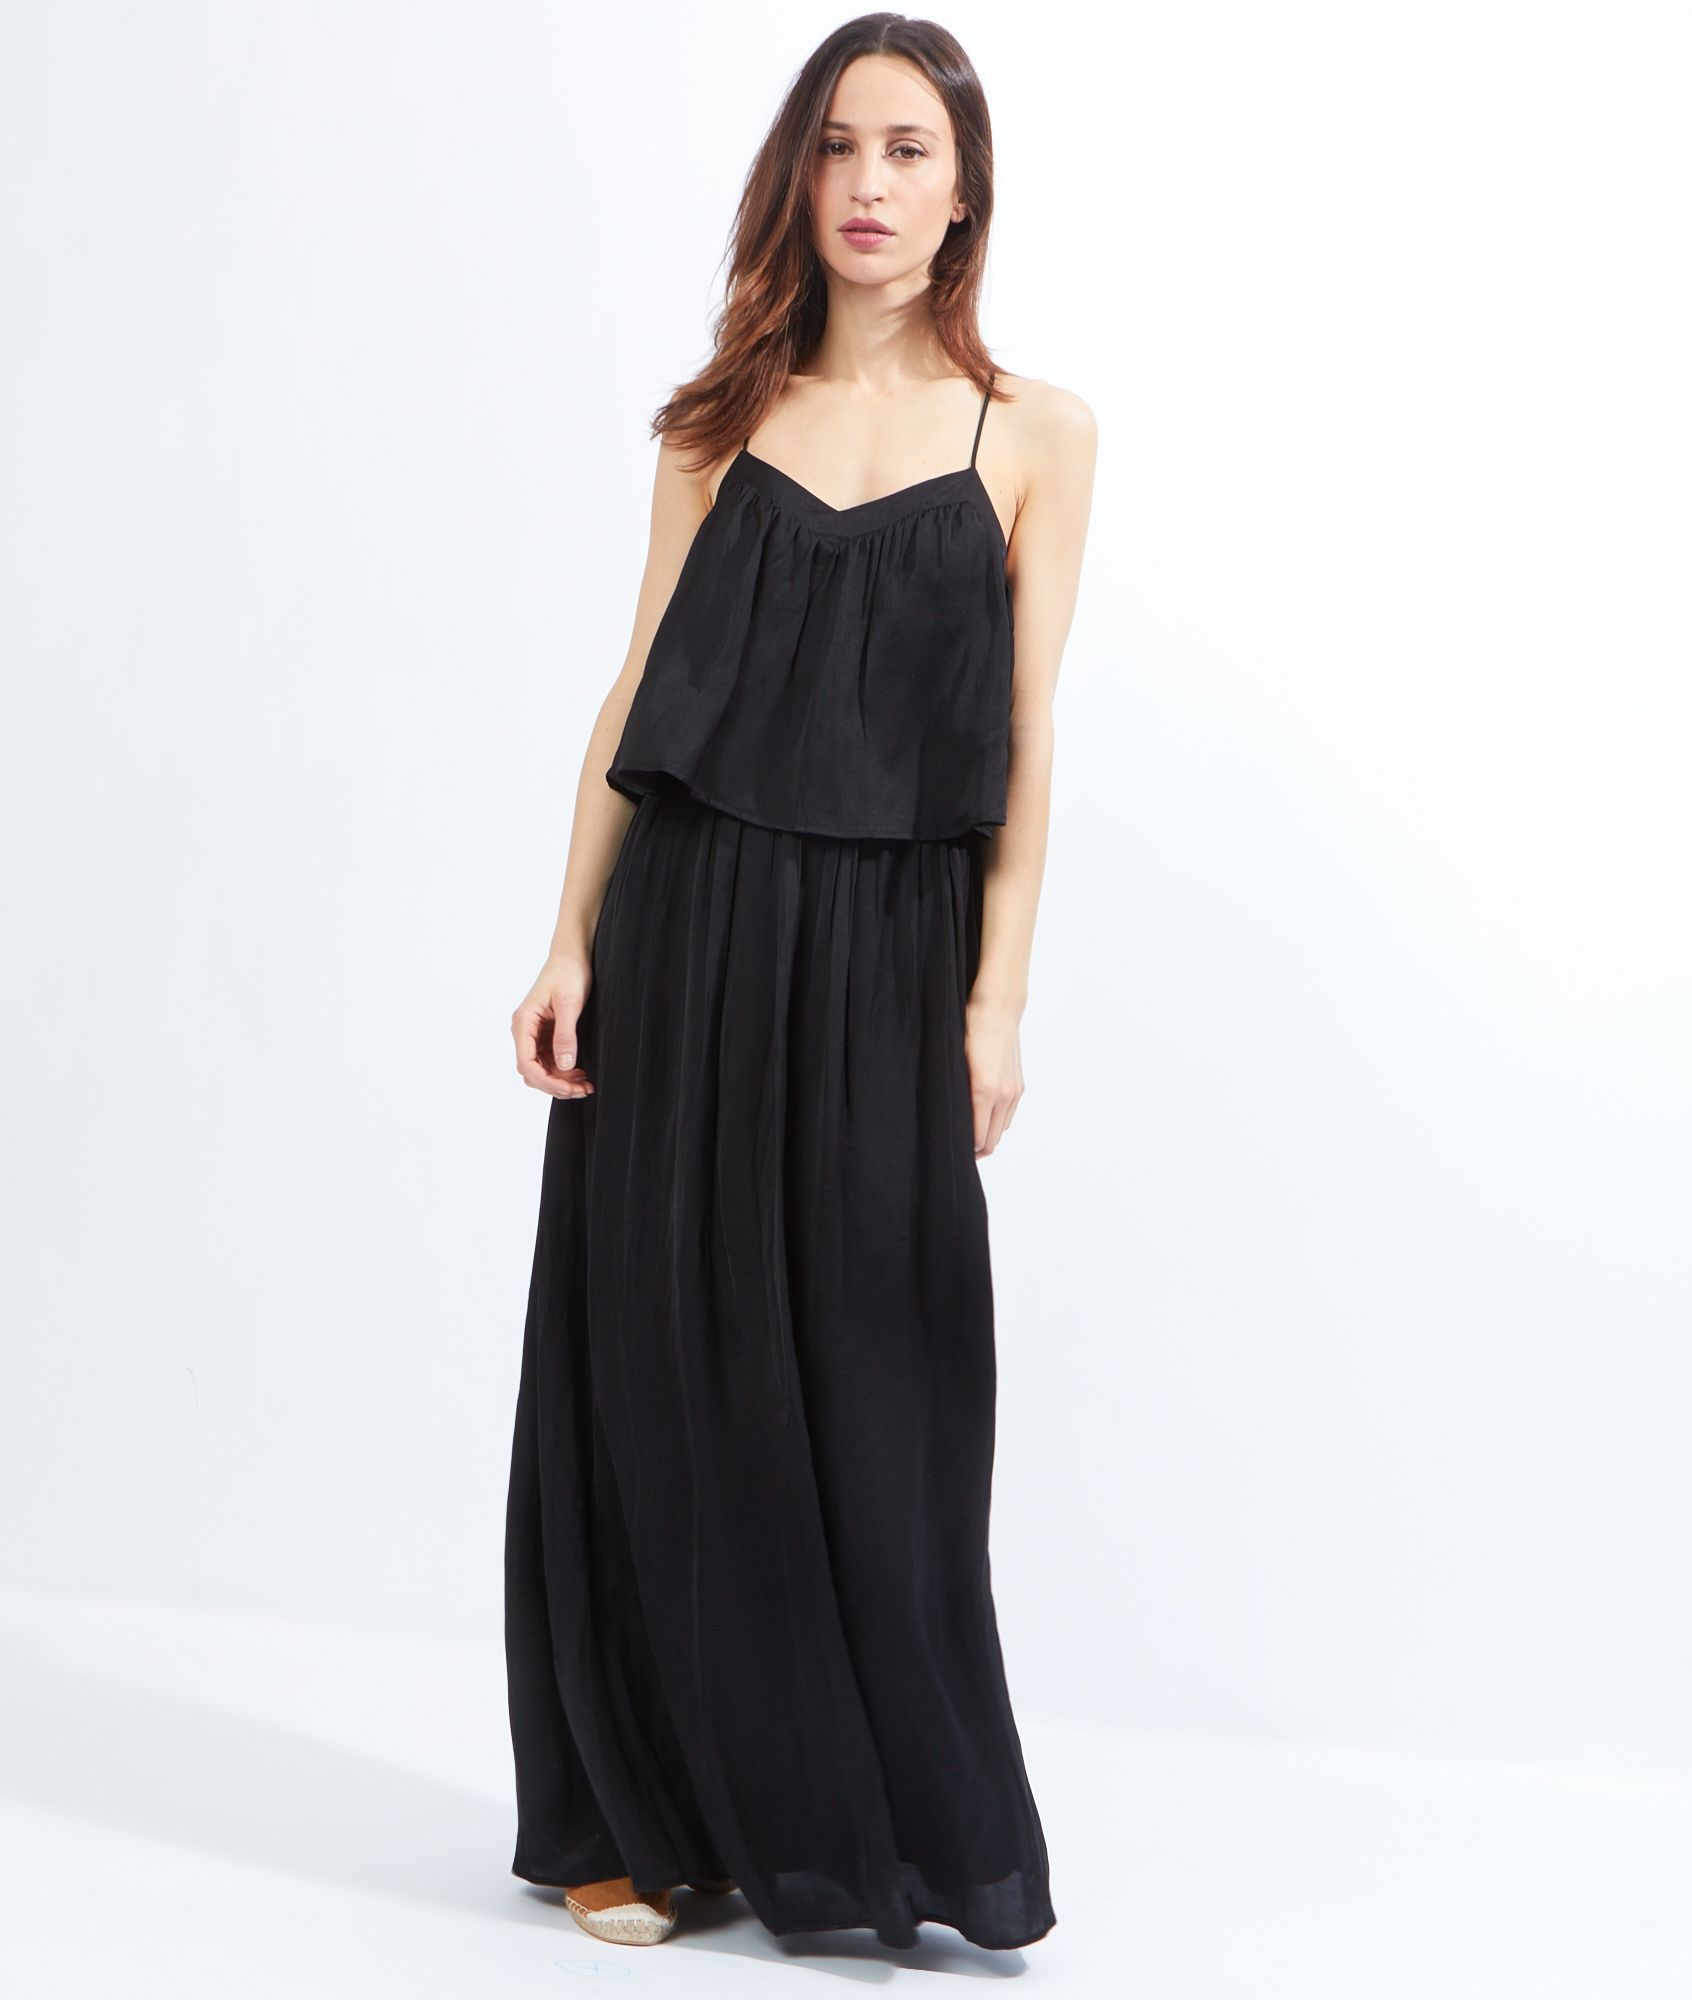 robe longue fluide volants loreta noir etam mode. Black Bedroom Furniture Sets. Home Design Ideas